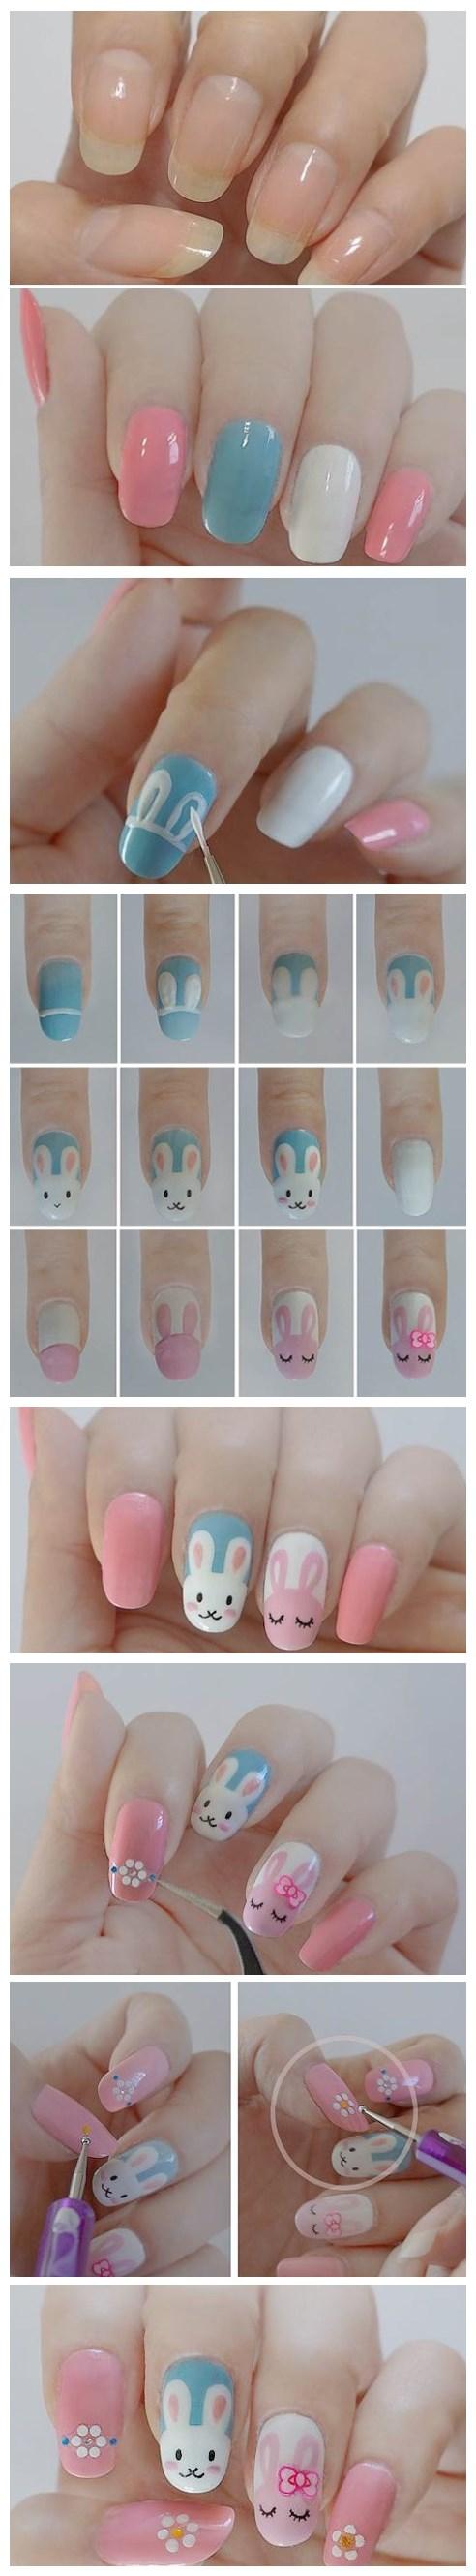 Diy cute easter bunny nail polish manicure design nails